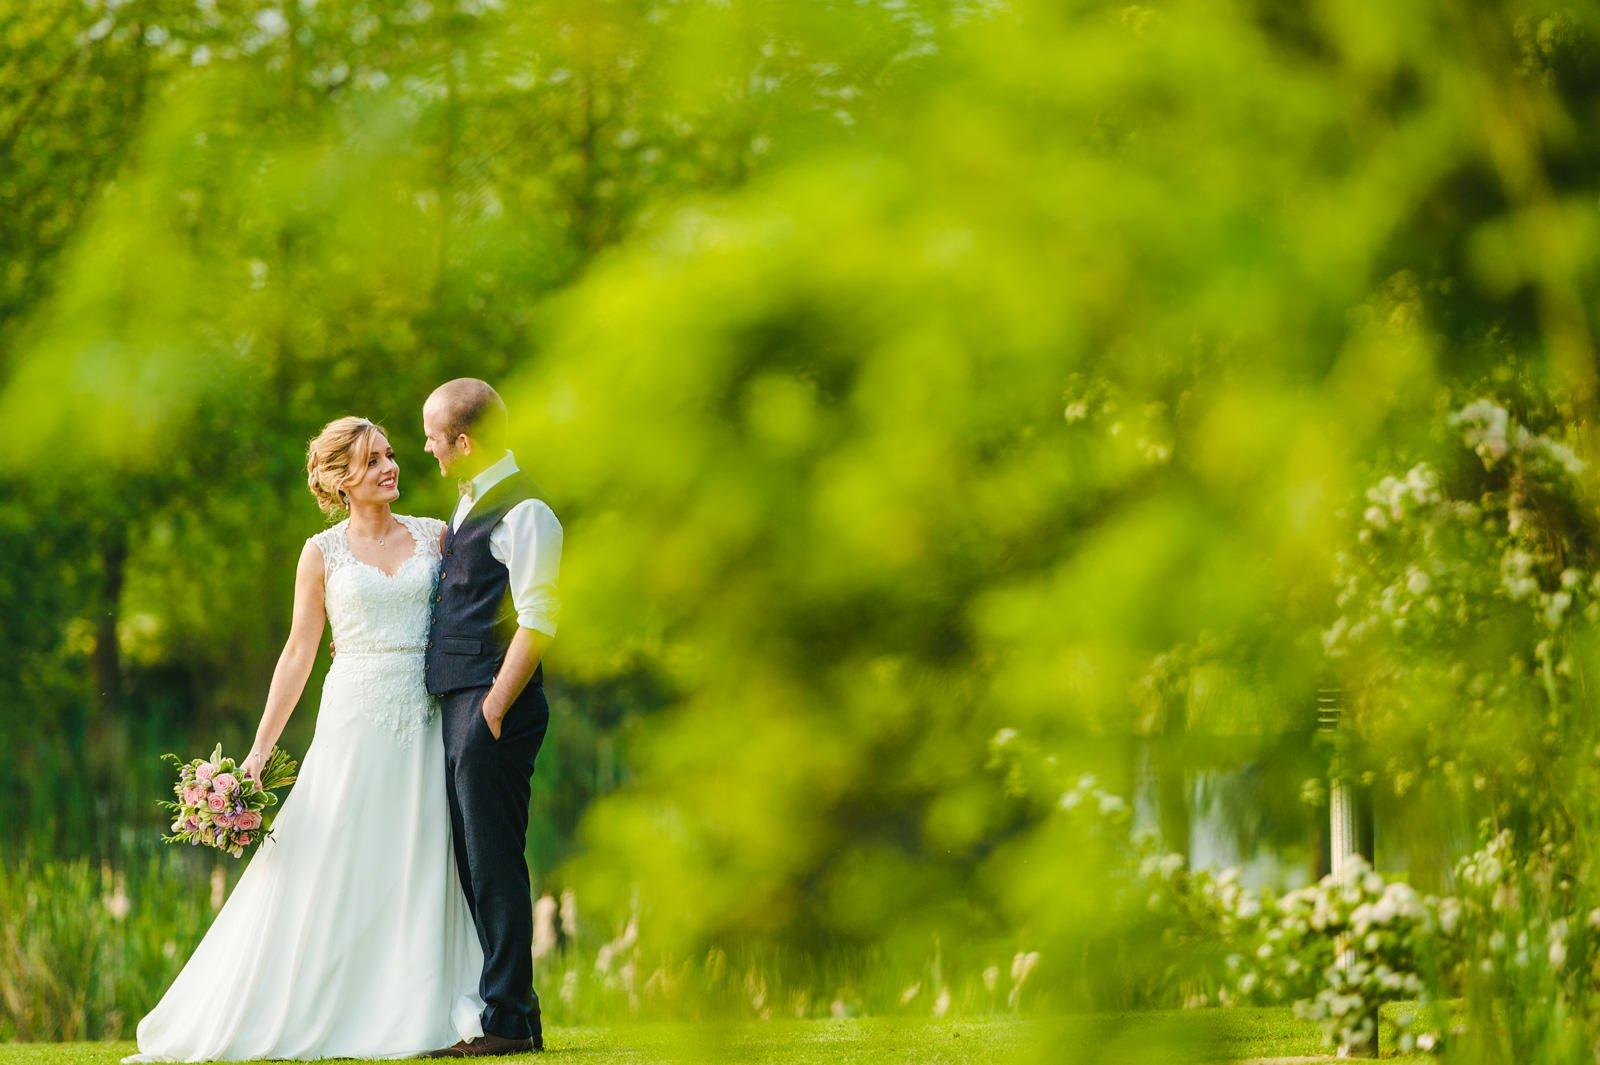 Millers Of Netley wedding, Dorrington, Shrewsbury | Emma + Ben 84